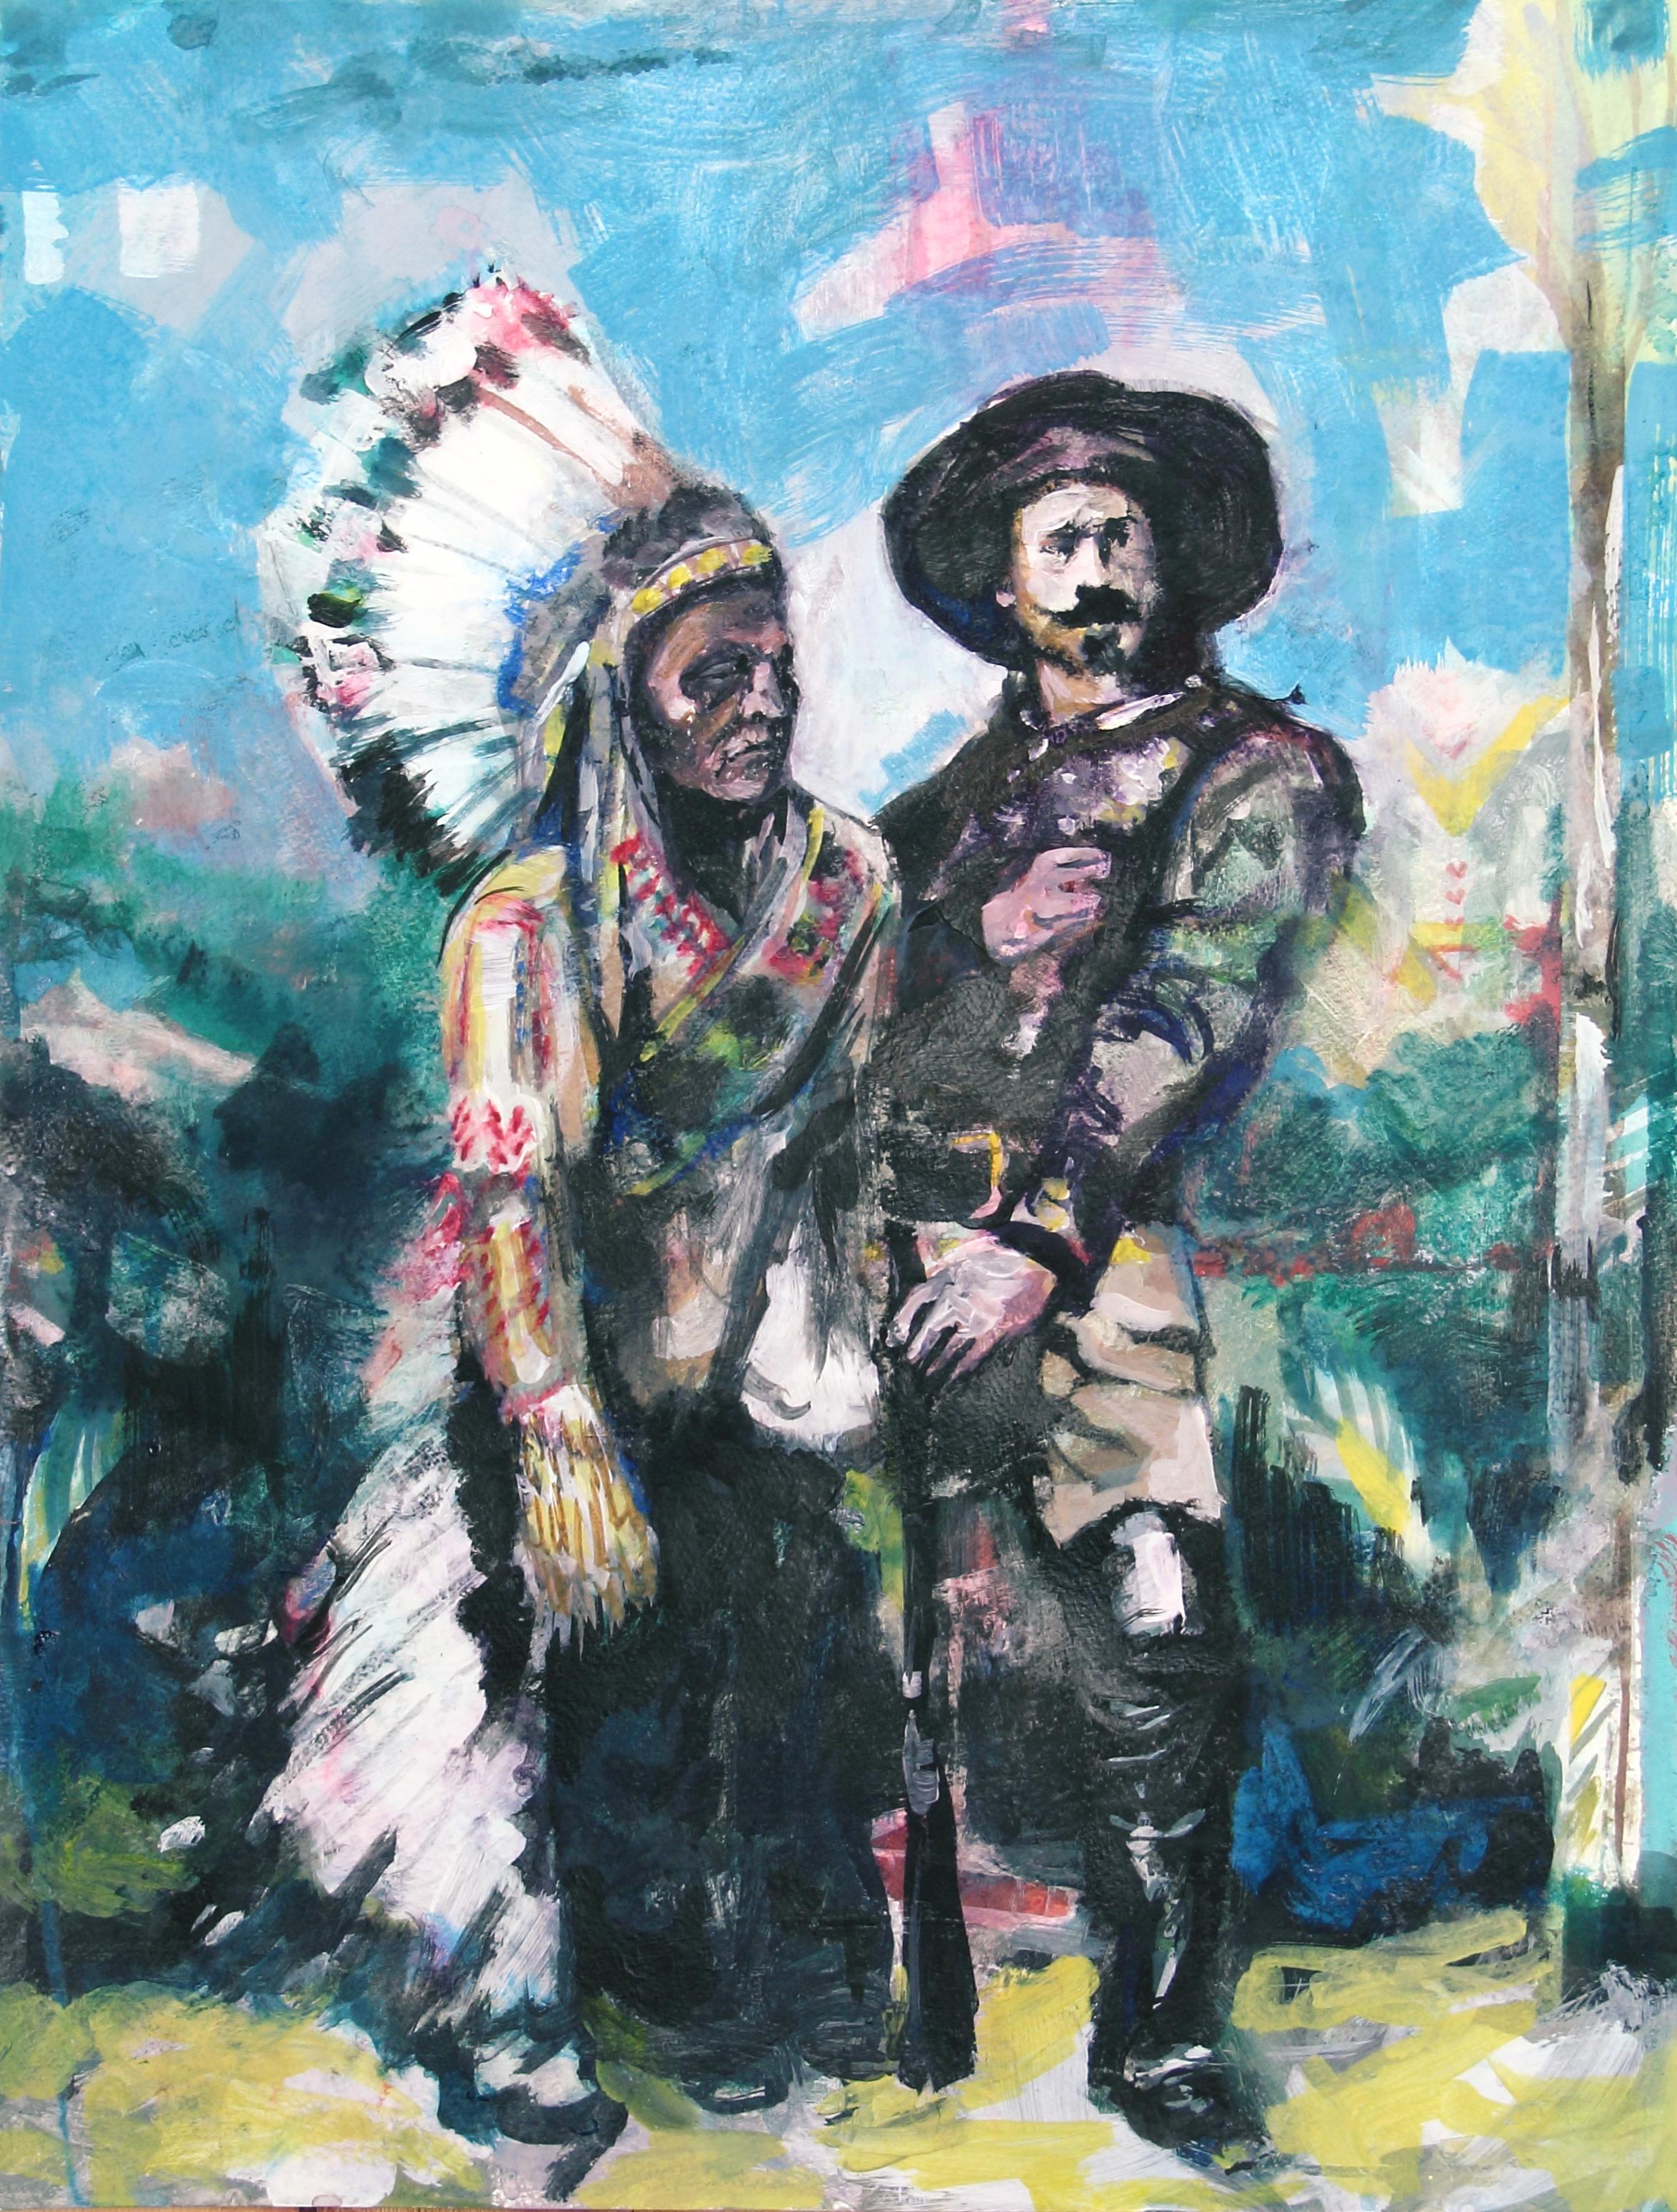 Sitting Bull & Buffalo Bill After the Show